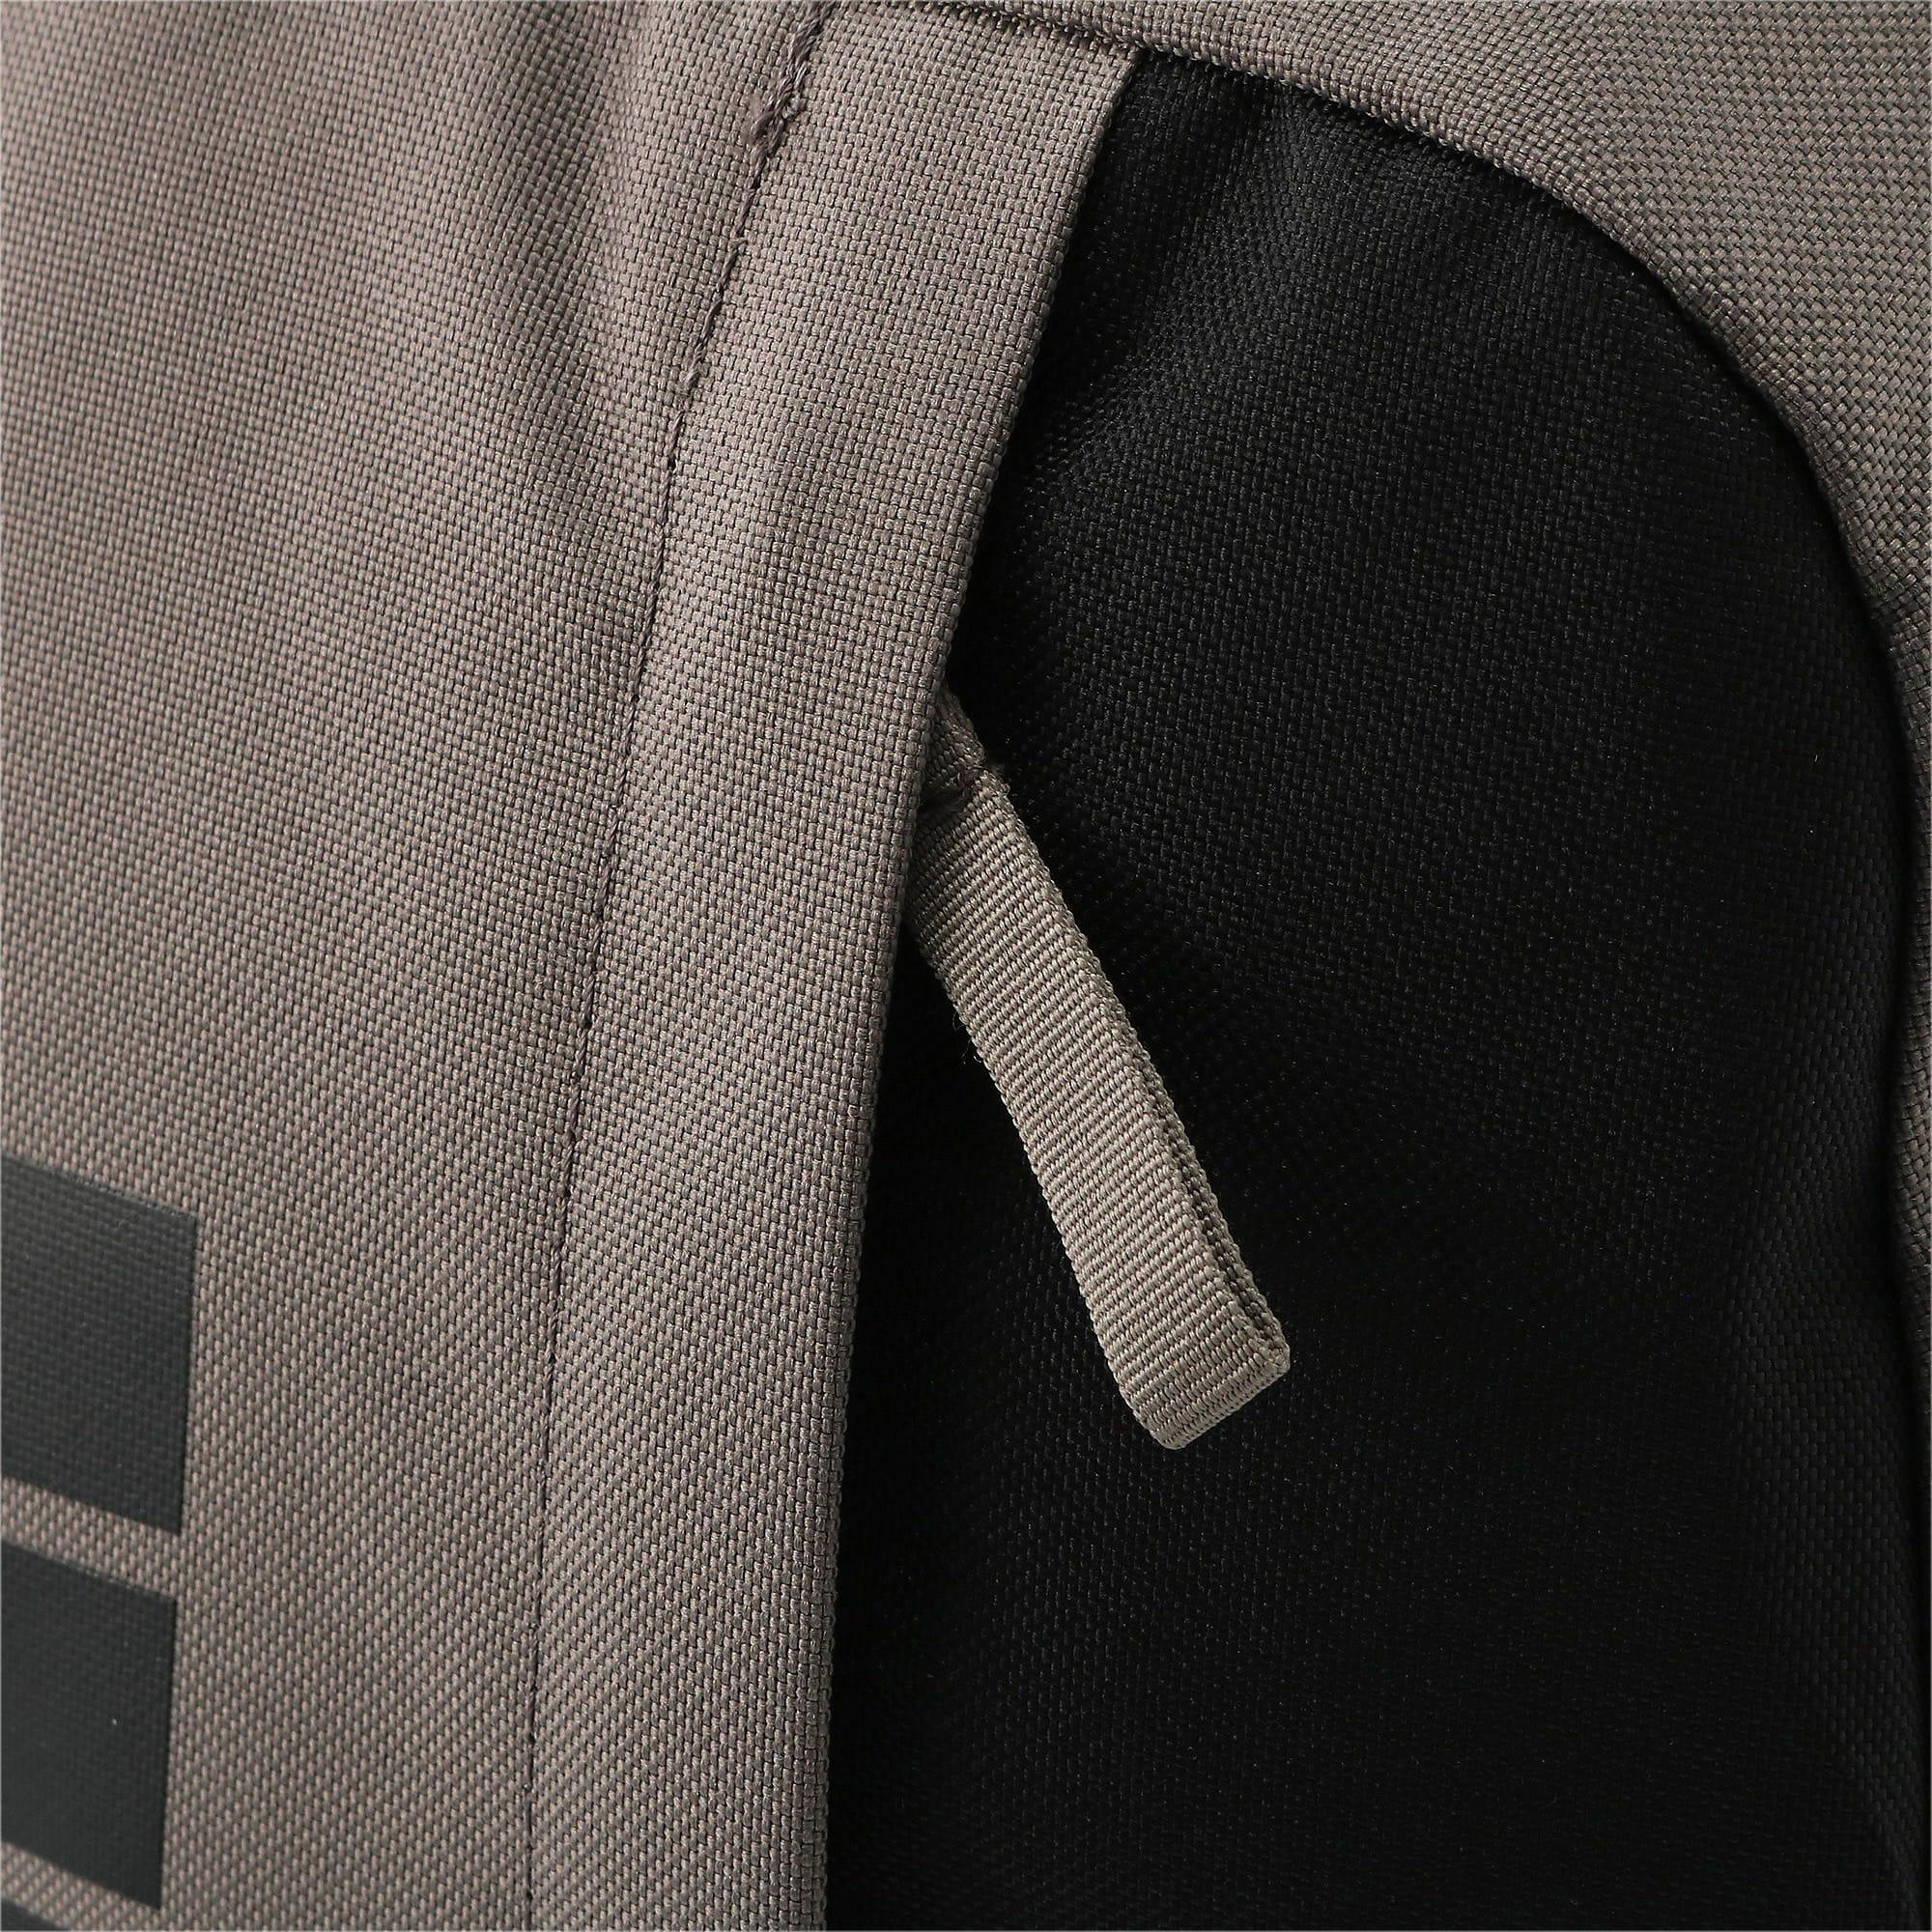 Thumbnail 8 of プーマ プラス バックパック II, Charcoal Gray-Puma Black, medium-JPN